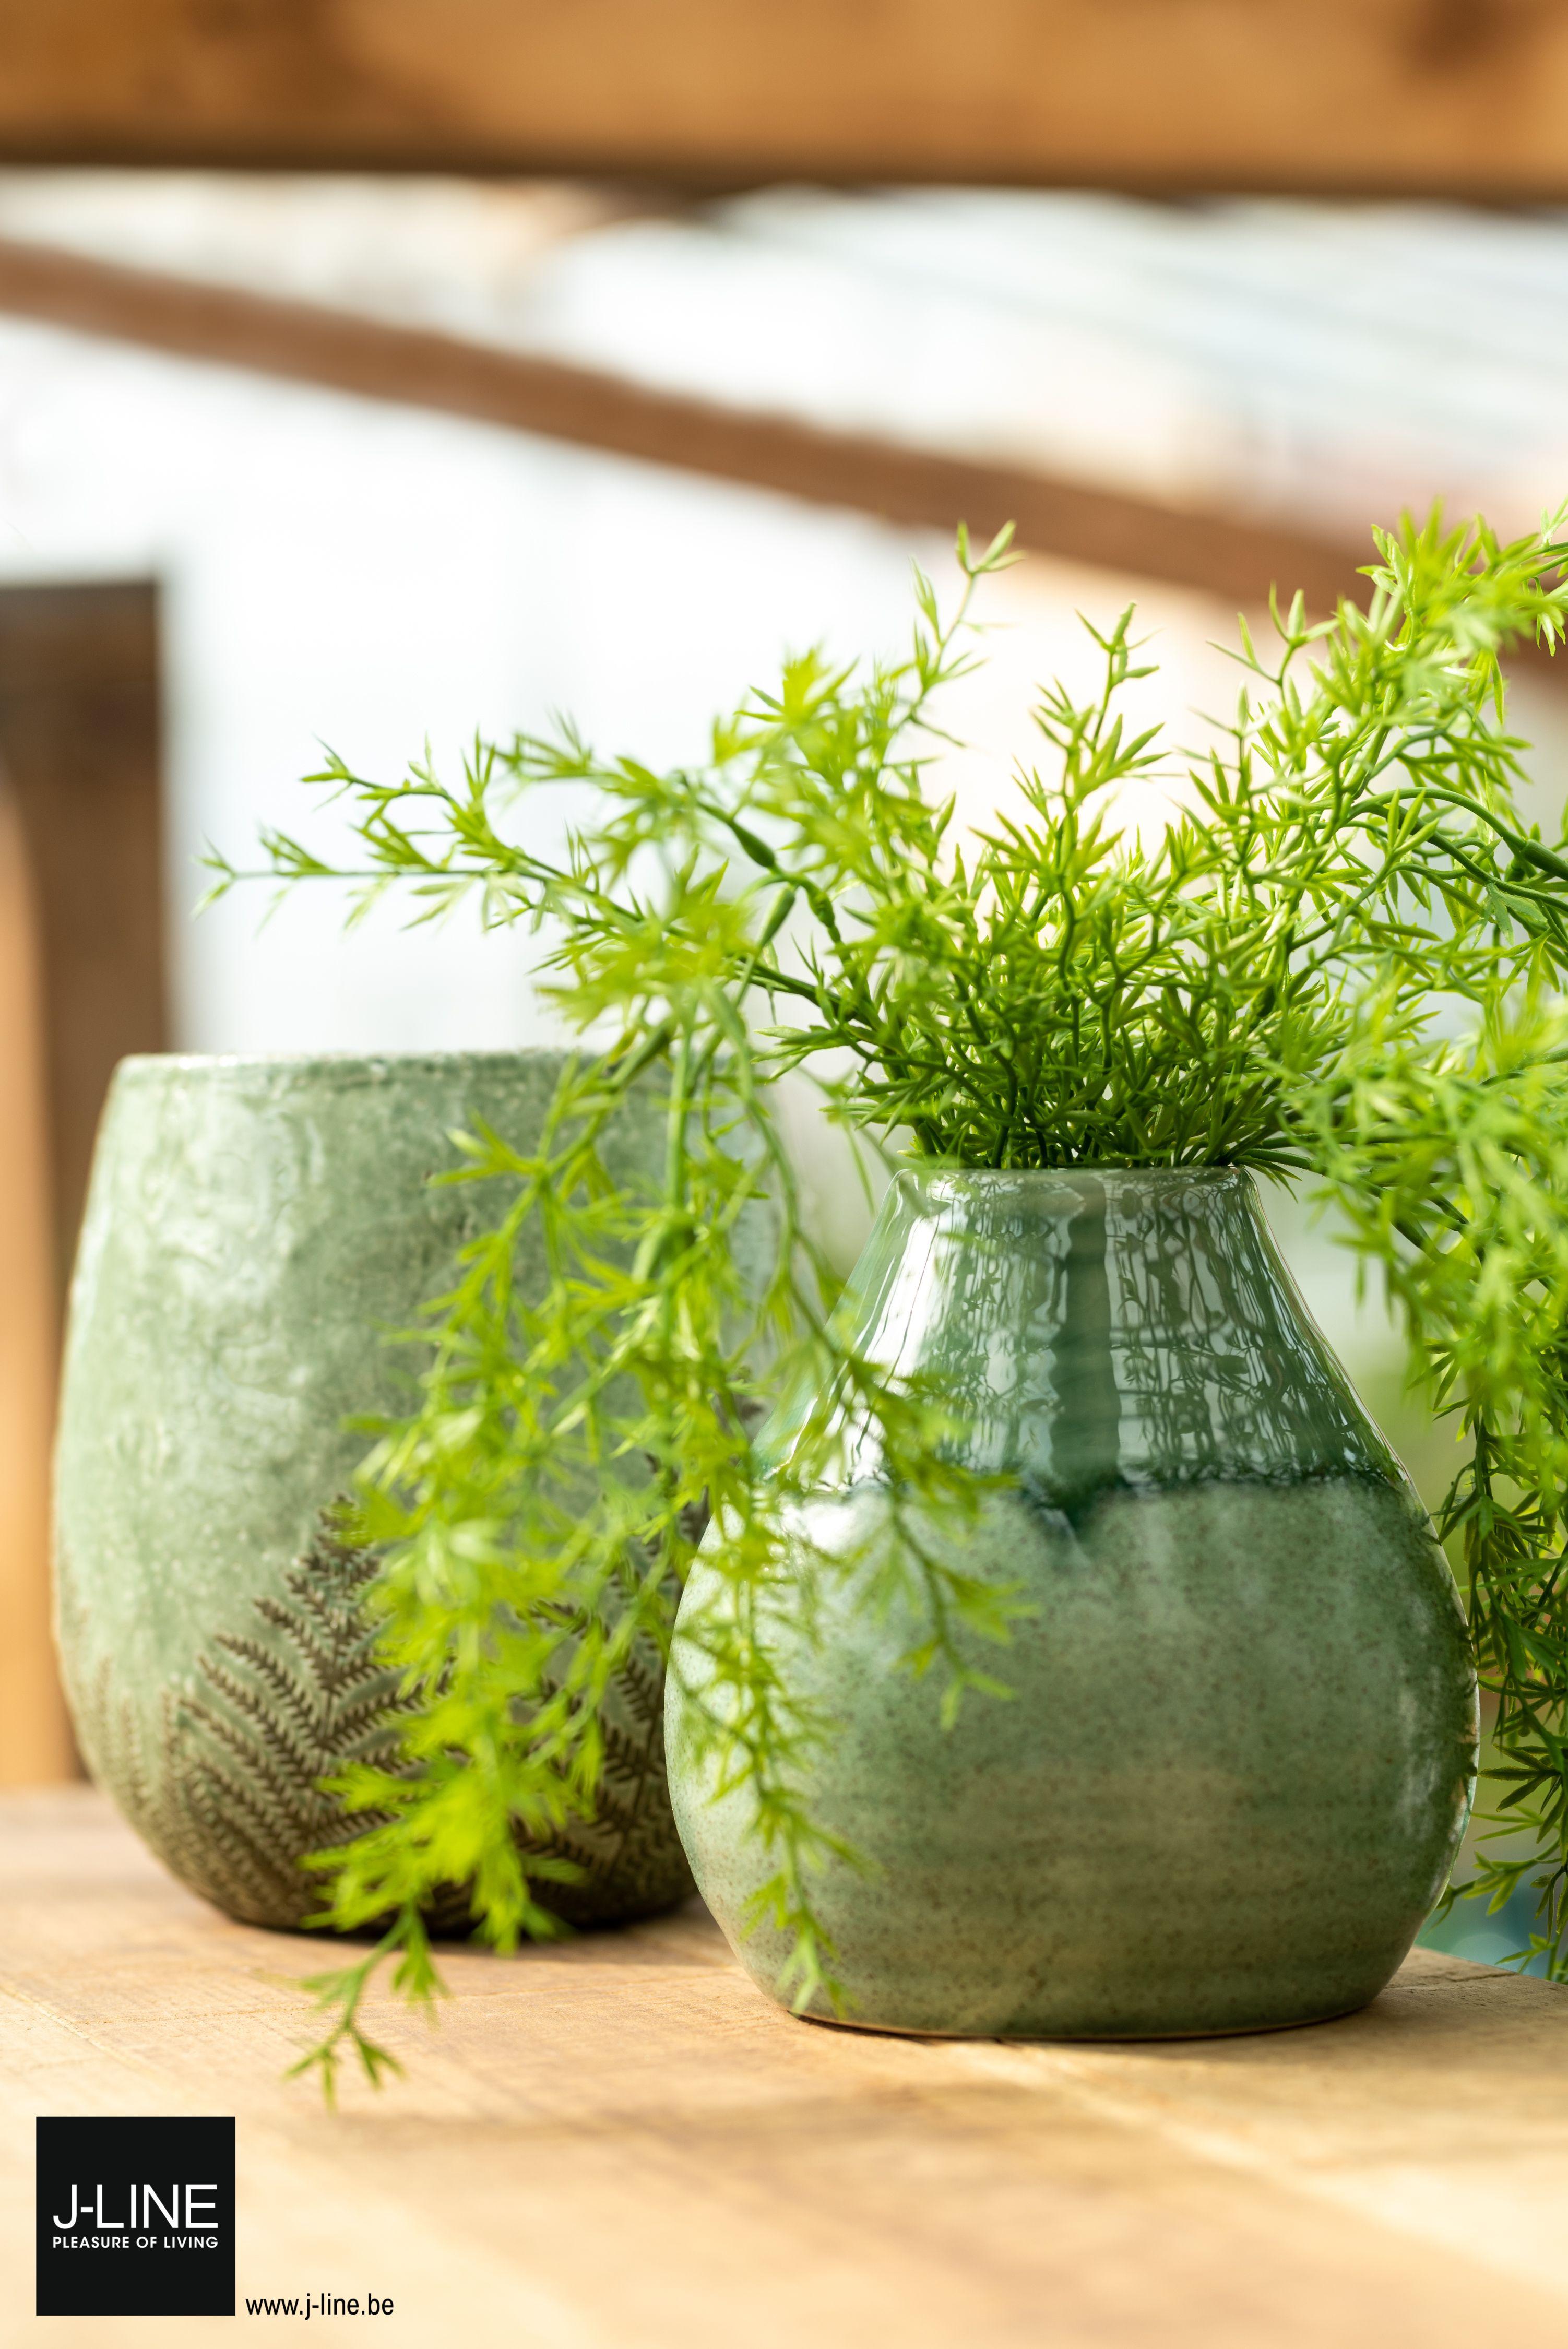 Jline Decoration Tropical Lagoon Spring Summer New Collection Ss2019 Flowerpot Vase Green Pleasureofliving Jlinedecoration